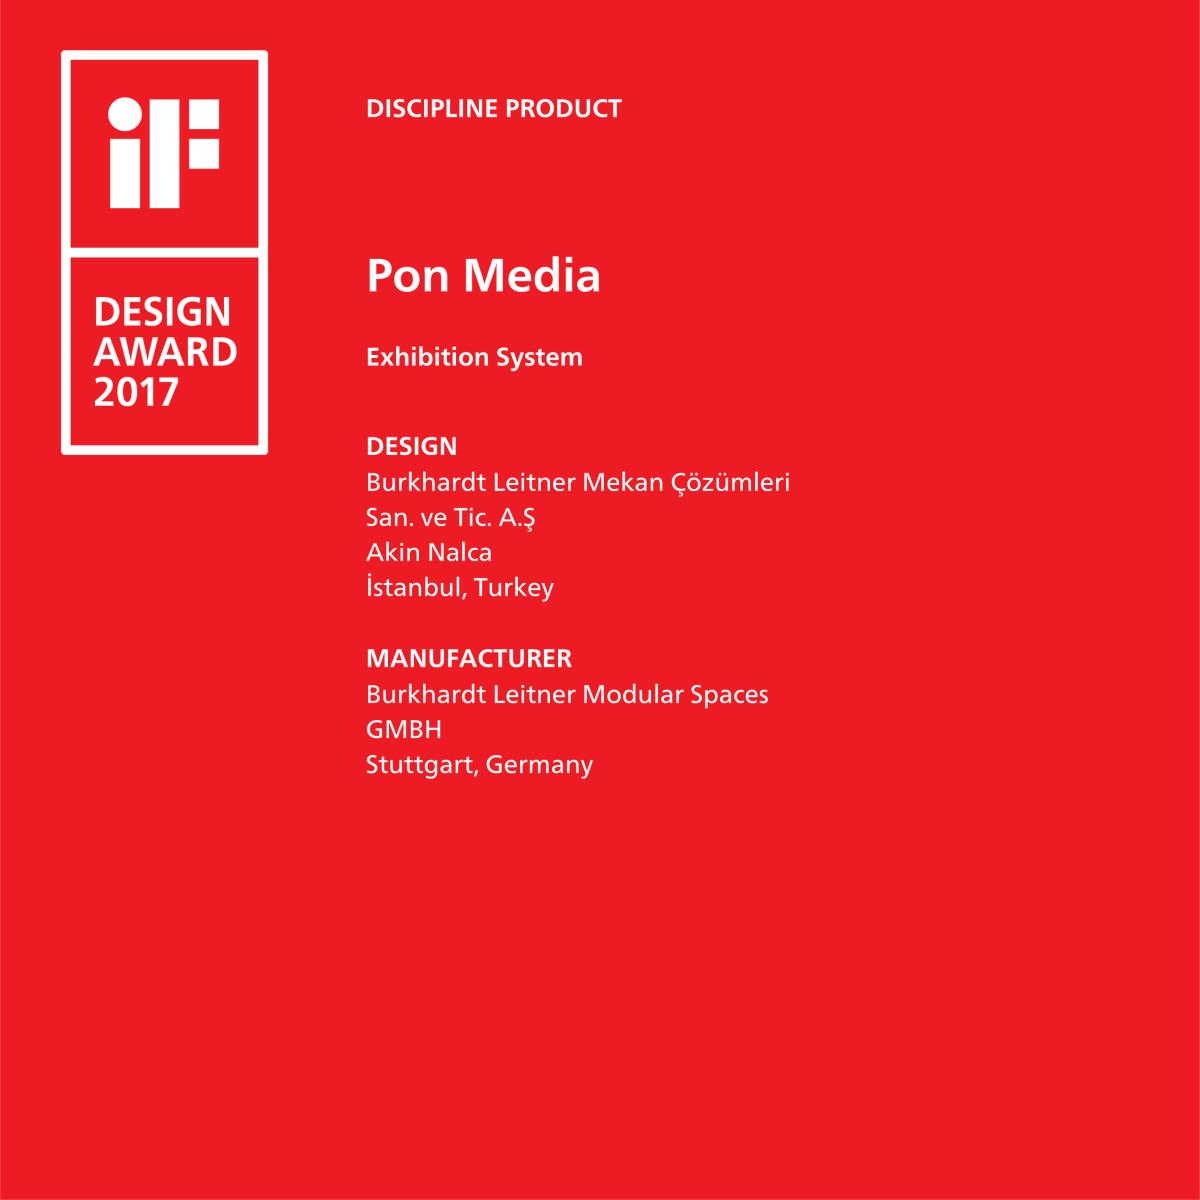 IF design award 2017